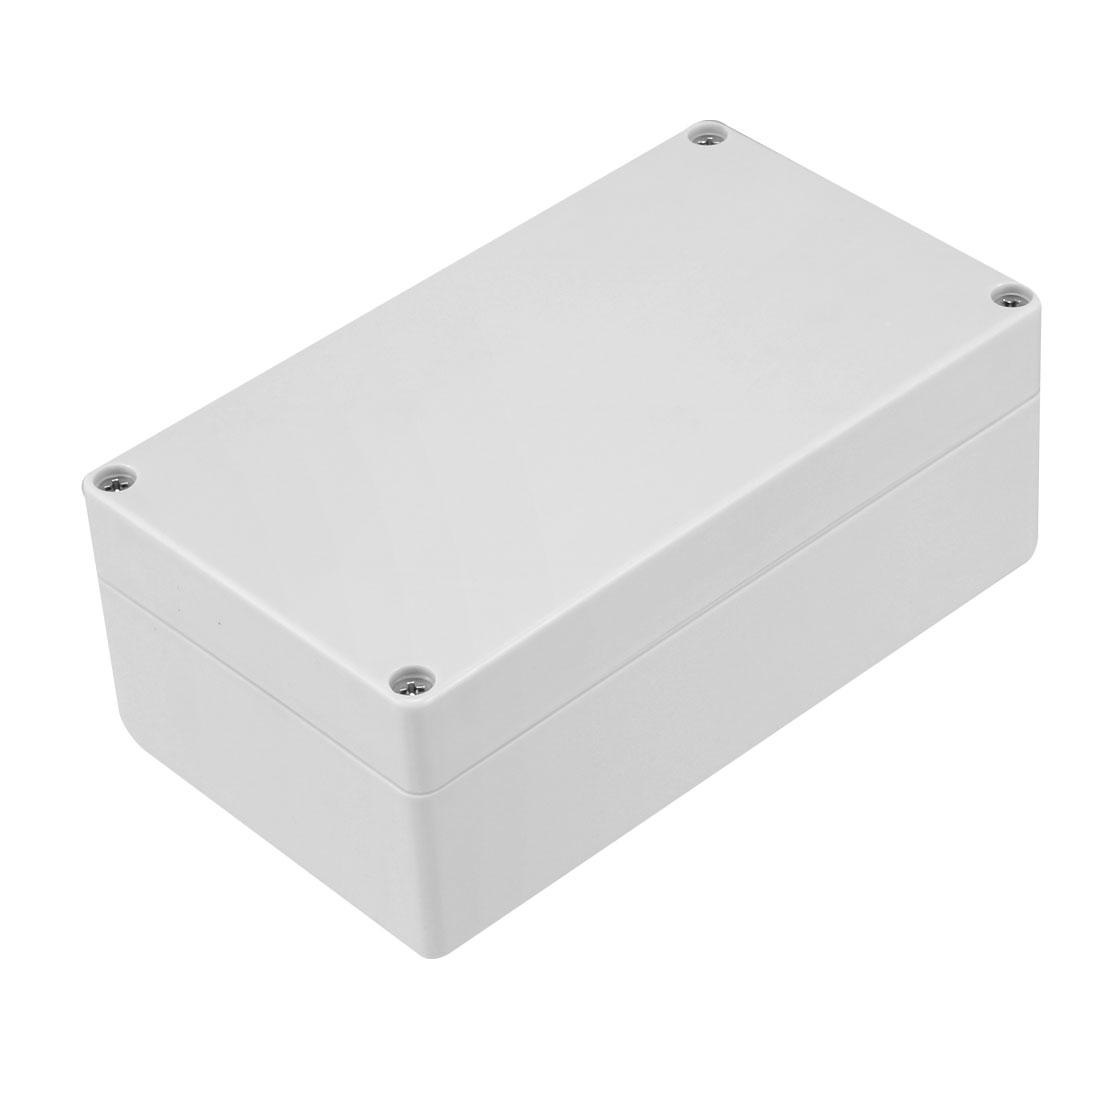 158mm x 90mm x 60mm IP65 Electronic Plastic DIY Junction Box Enclosure Case Gray